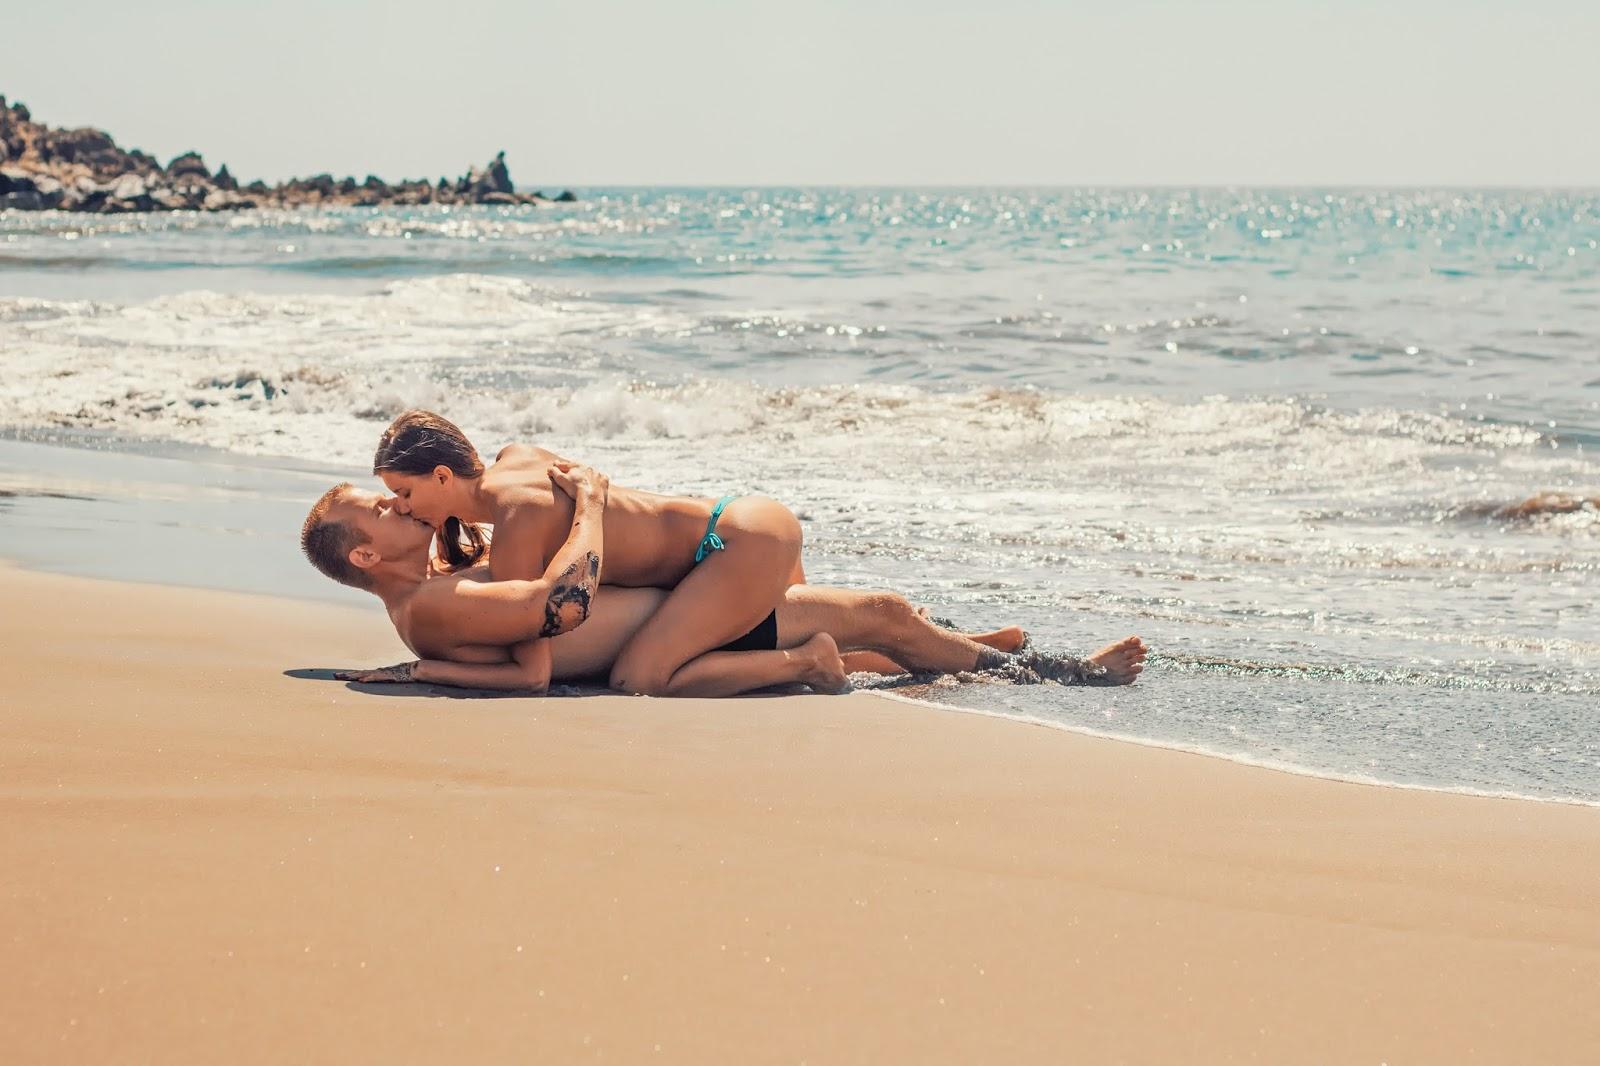 Girls on the beach having sex — 3